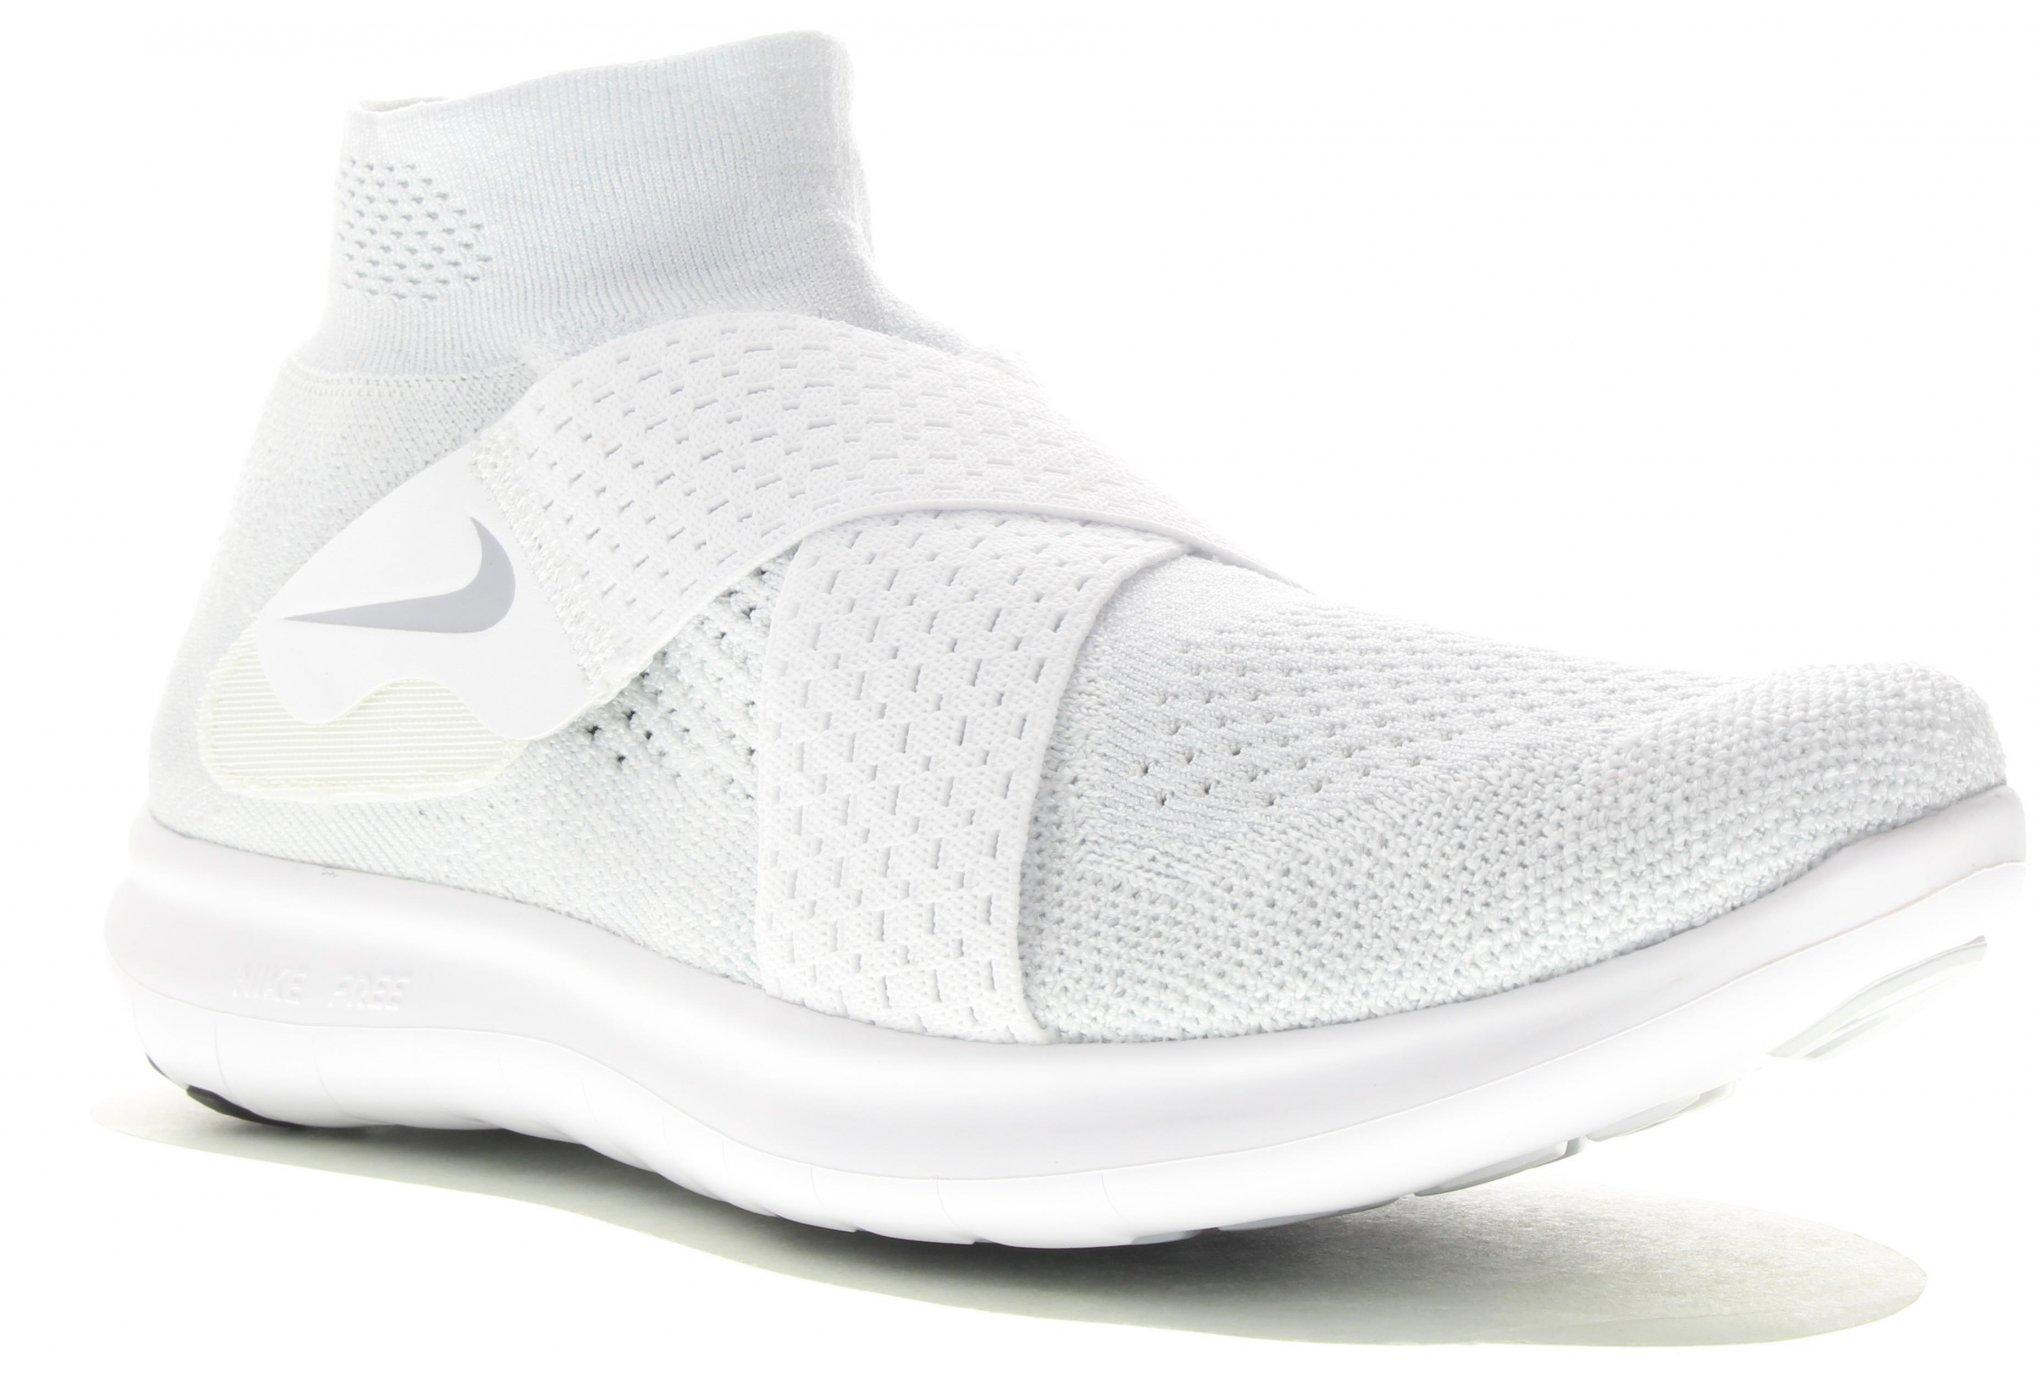 Nike Free RN Motion Flyknit 2017 W Diététique Chaussures femme